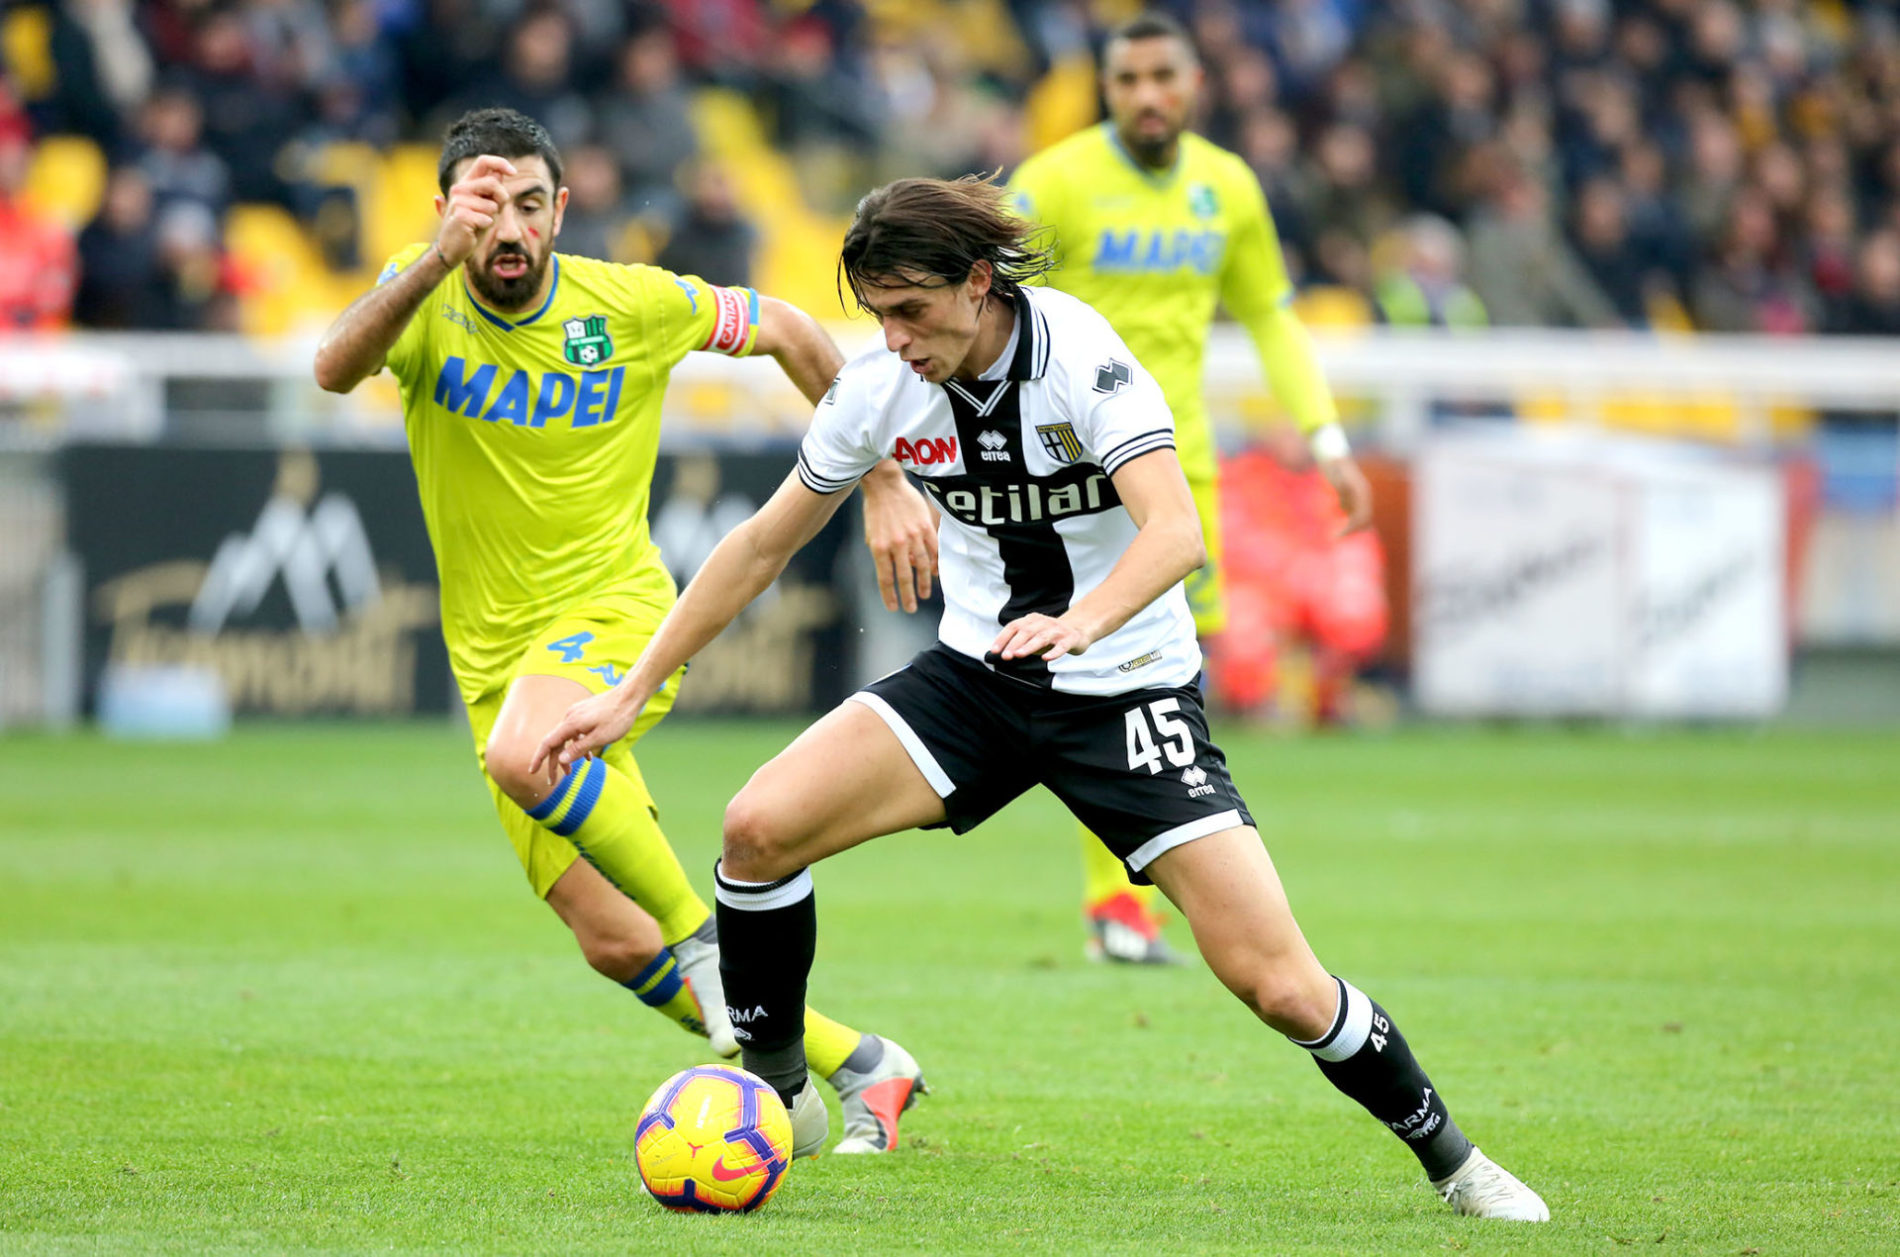 Inglese A Napoli Fuori Luogo A Parma Sto Bene Ma Forza Parma